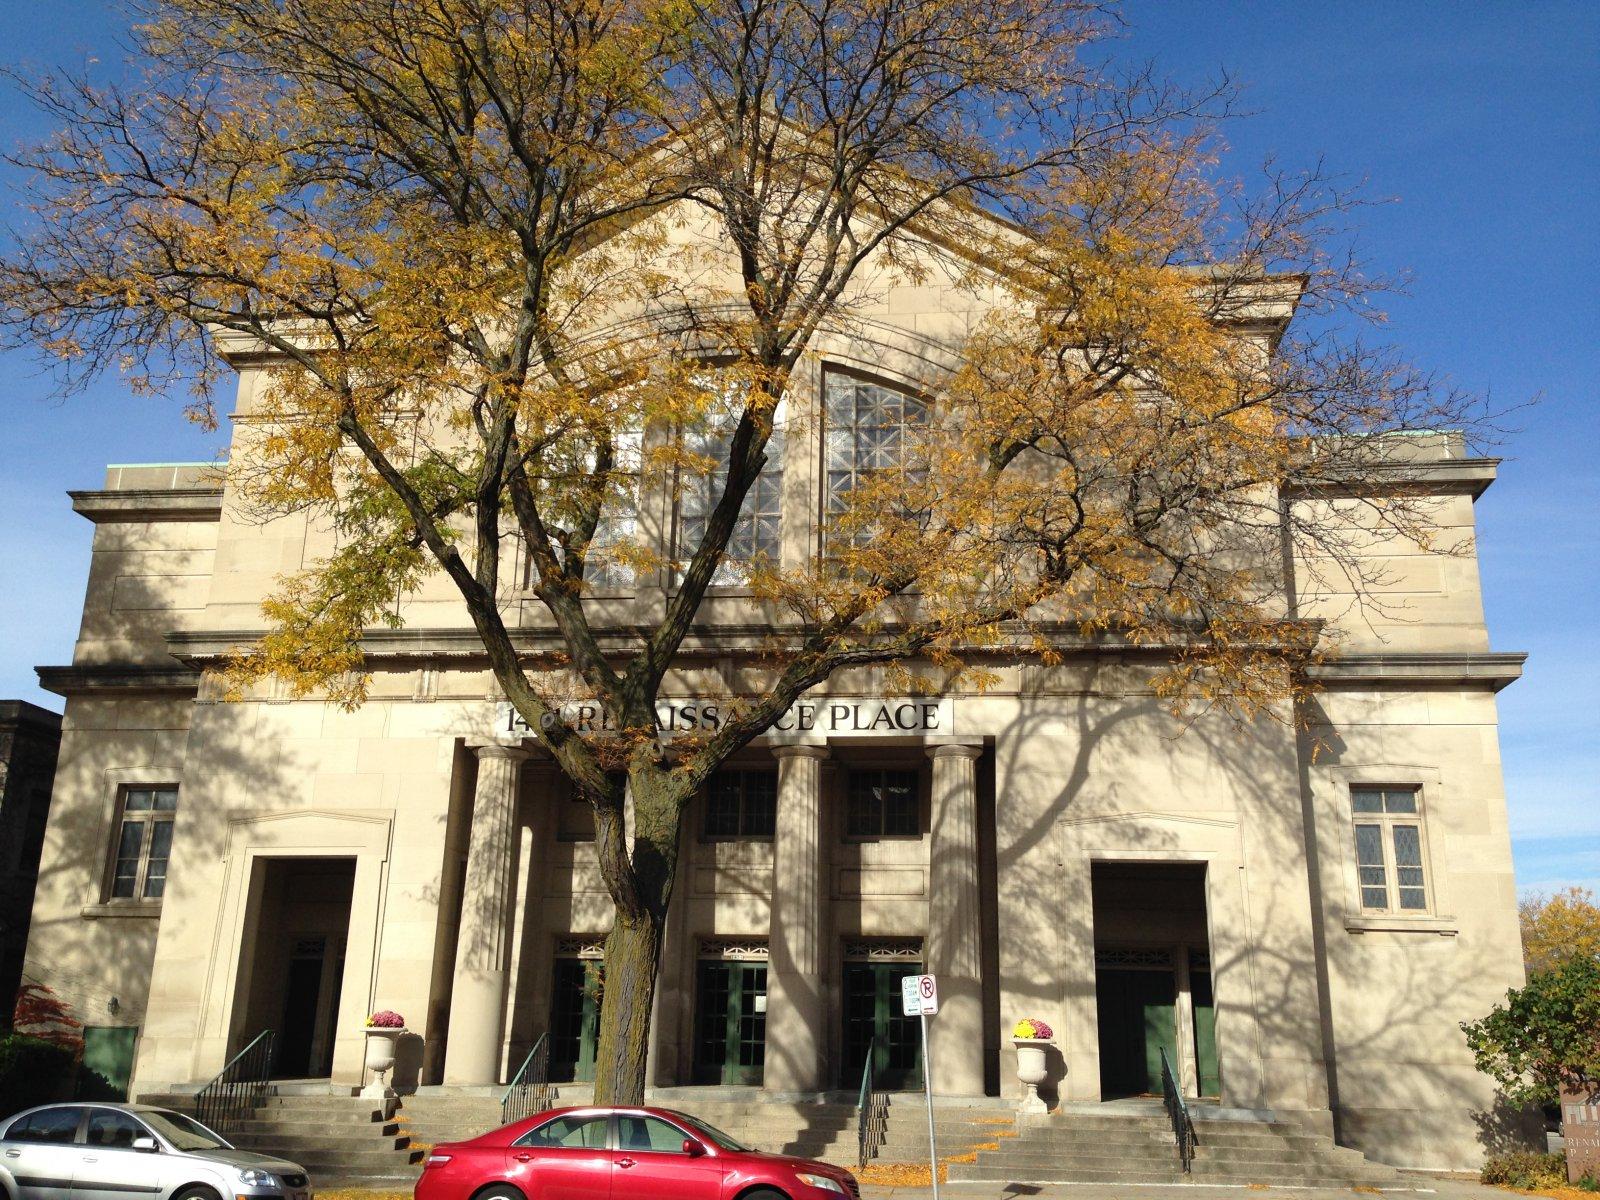 Renaissance Place Reception Hall, 1451 N. Prospect Ave